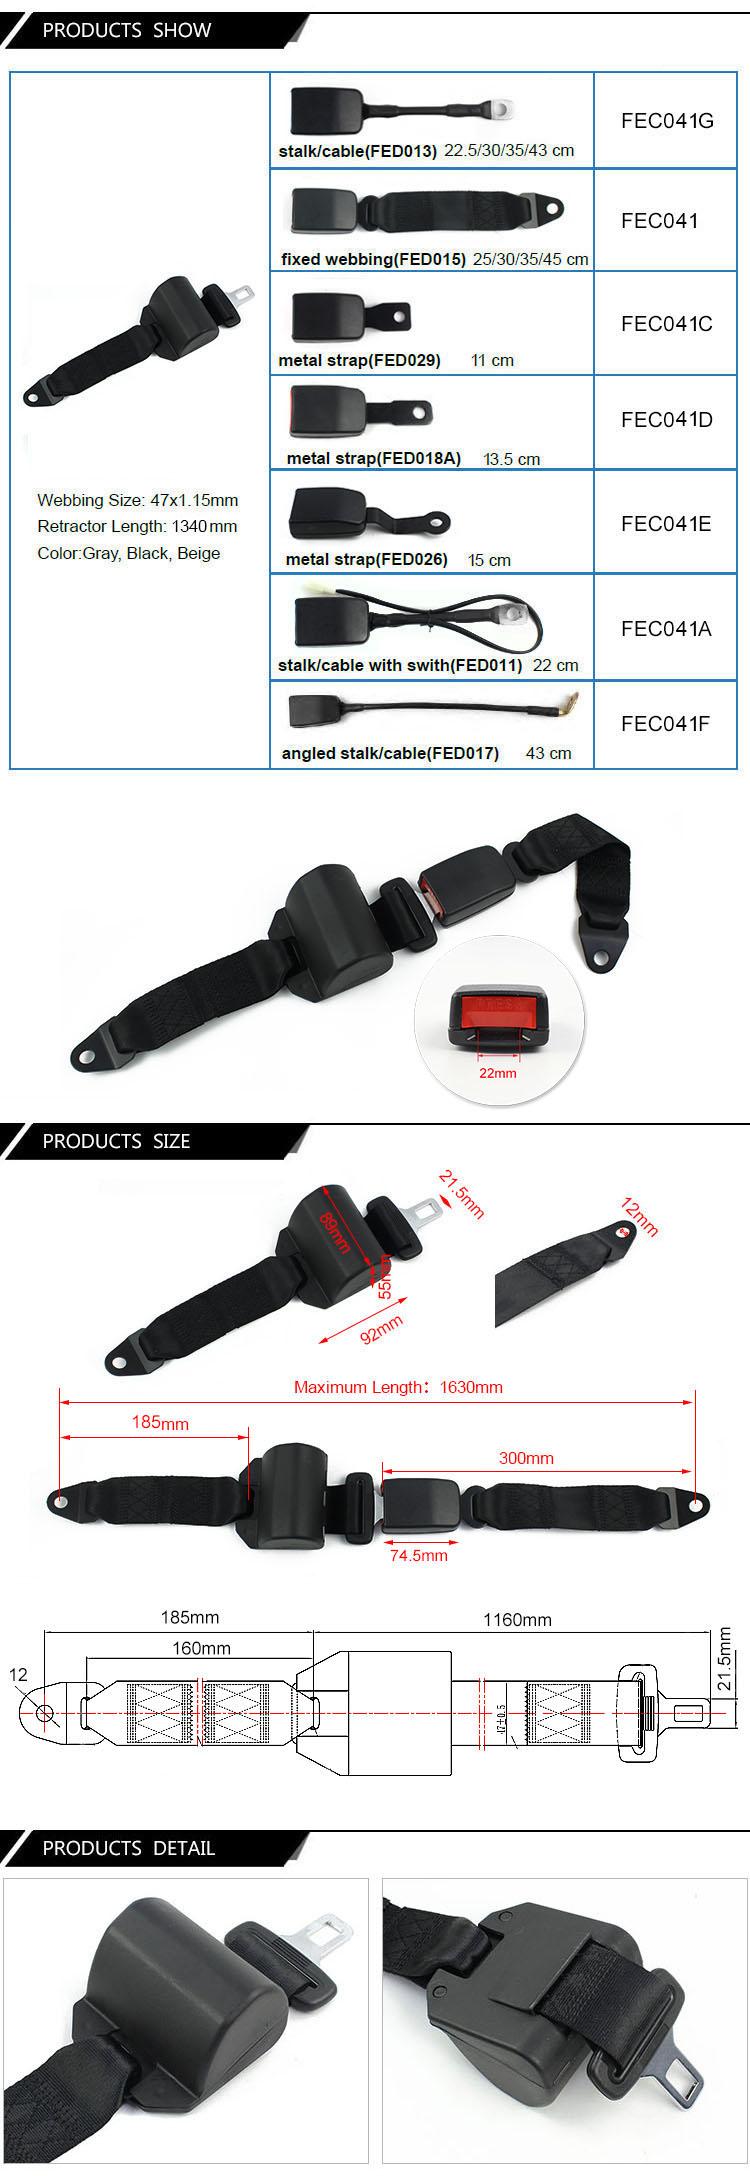 FEC041 Self-Retracting Safety Belts